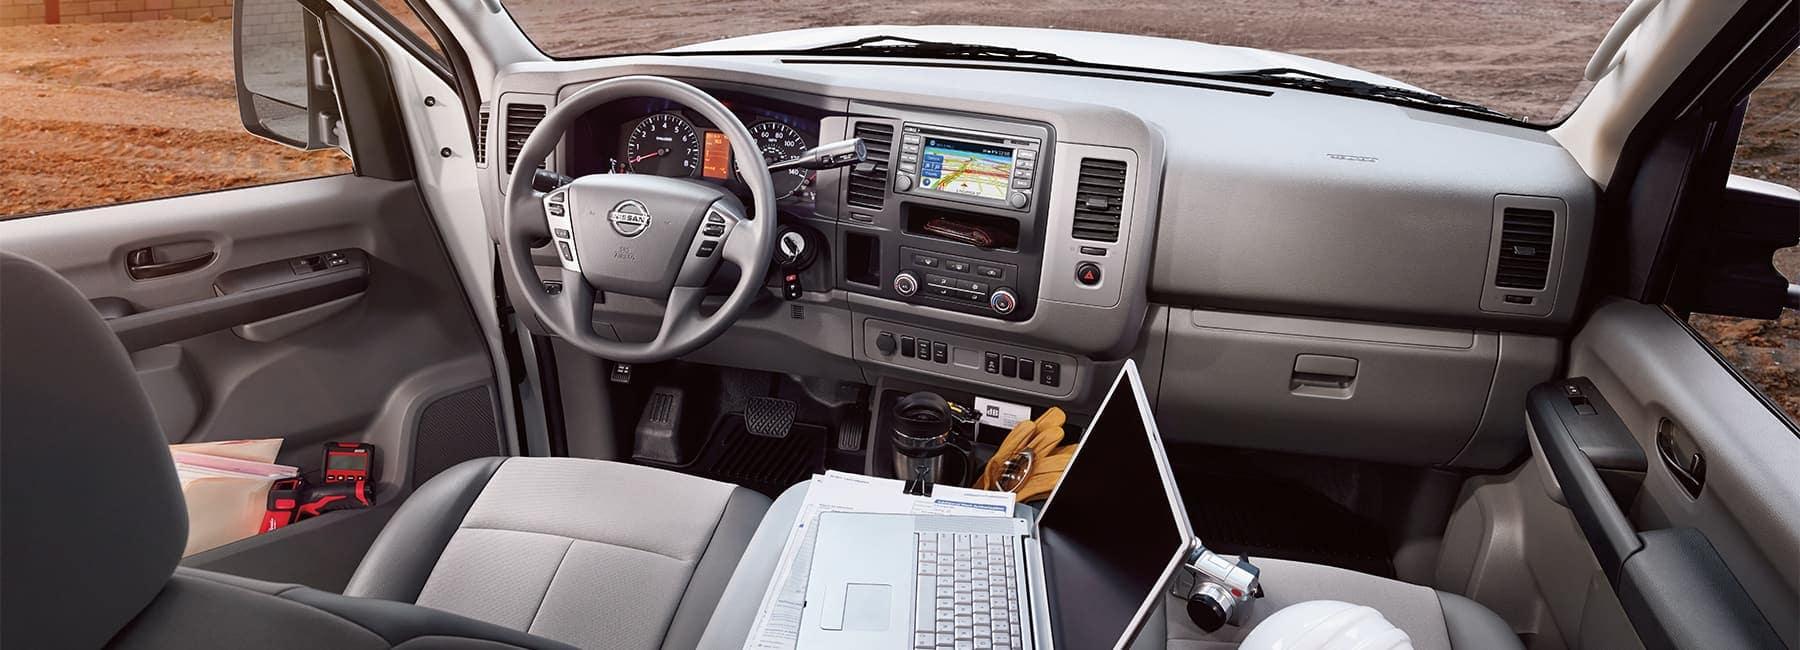 2020-nissan-nv-cargo-interior-laptop